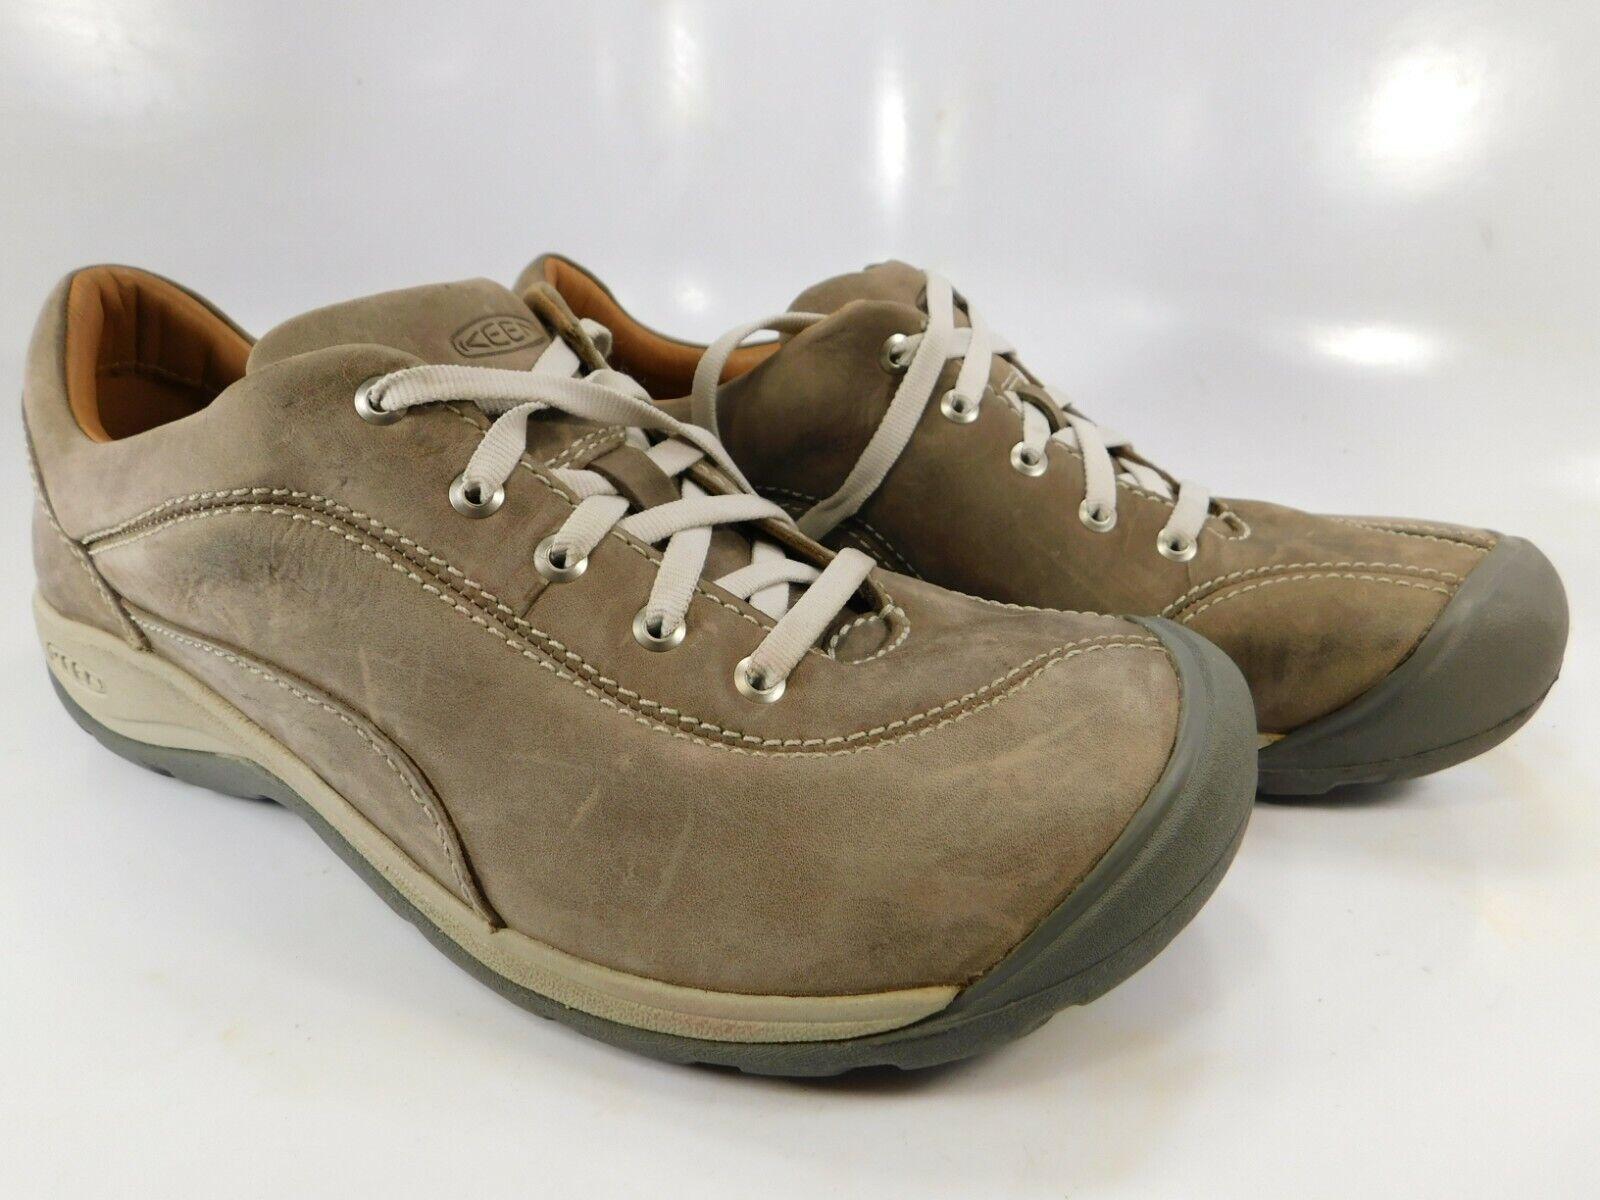 Keen Presidio II Größe 9 M (B) Eu 39.5 Damen Lässig Oxford Schuhe Paloma 1018316